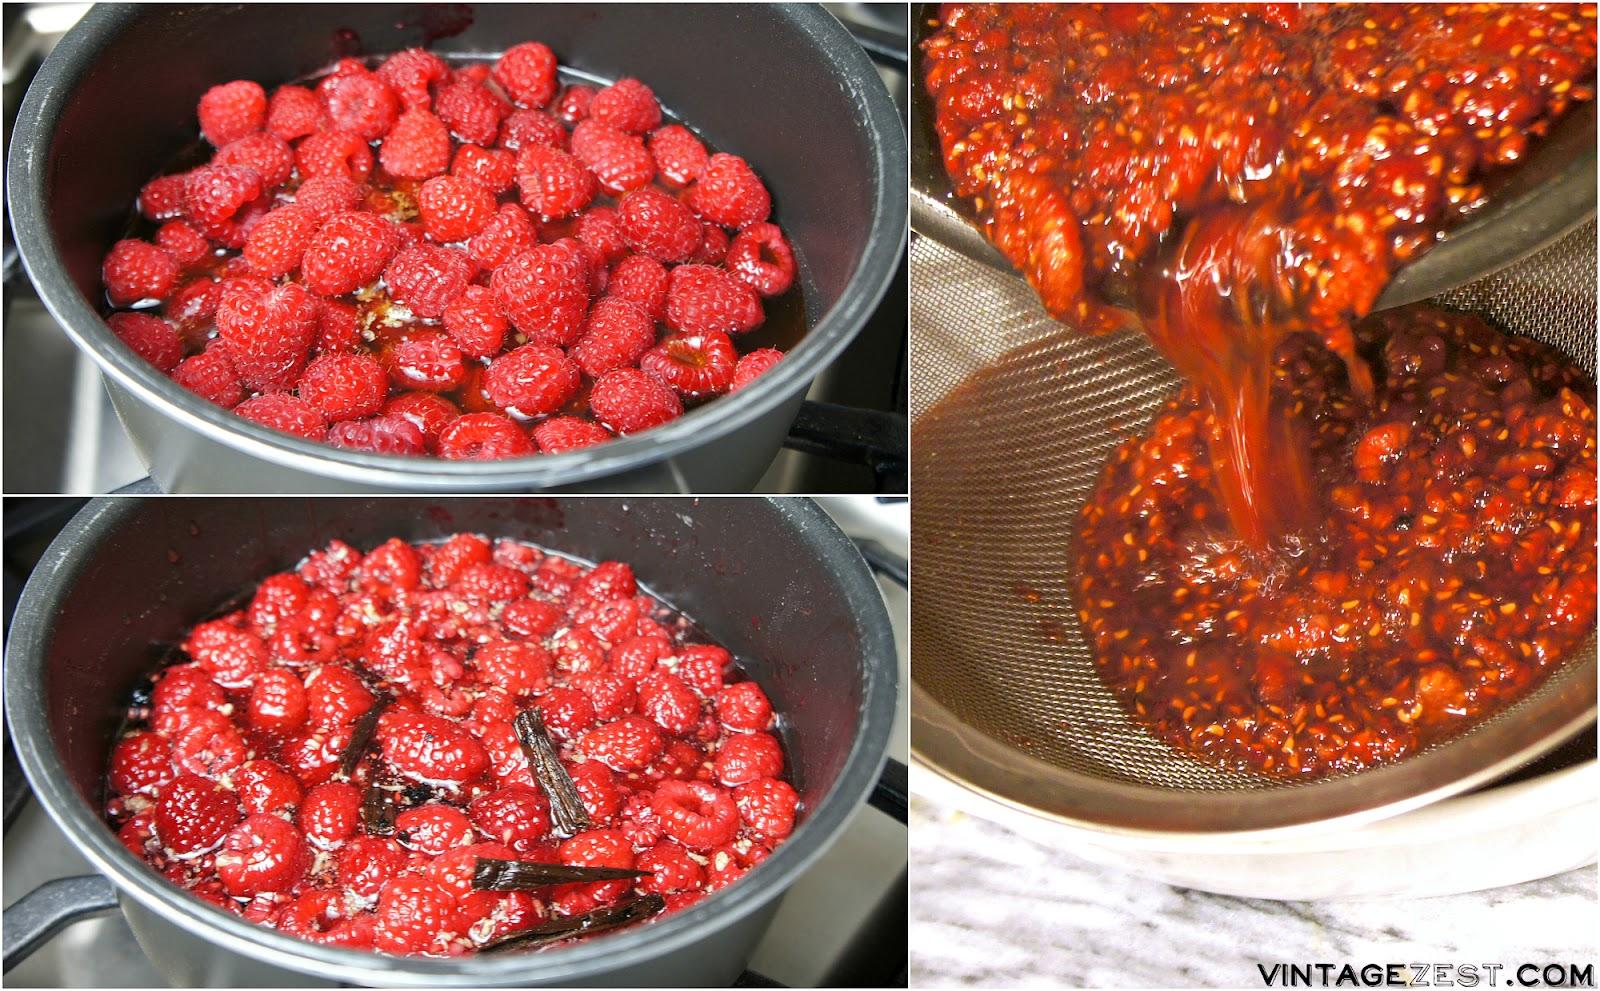 DIY Raspberry Vanilla Honey gifts on Vintage Zest #ad #HoneyforHolidays #easy #recipe